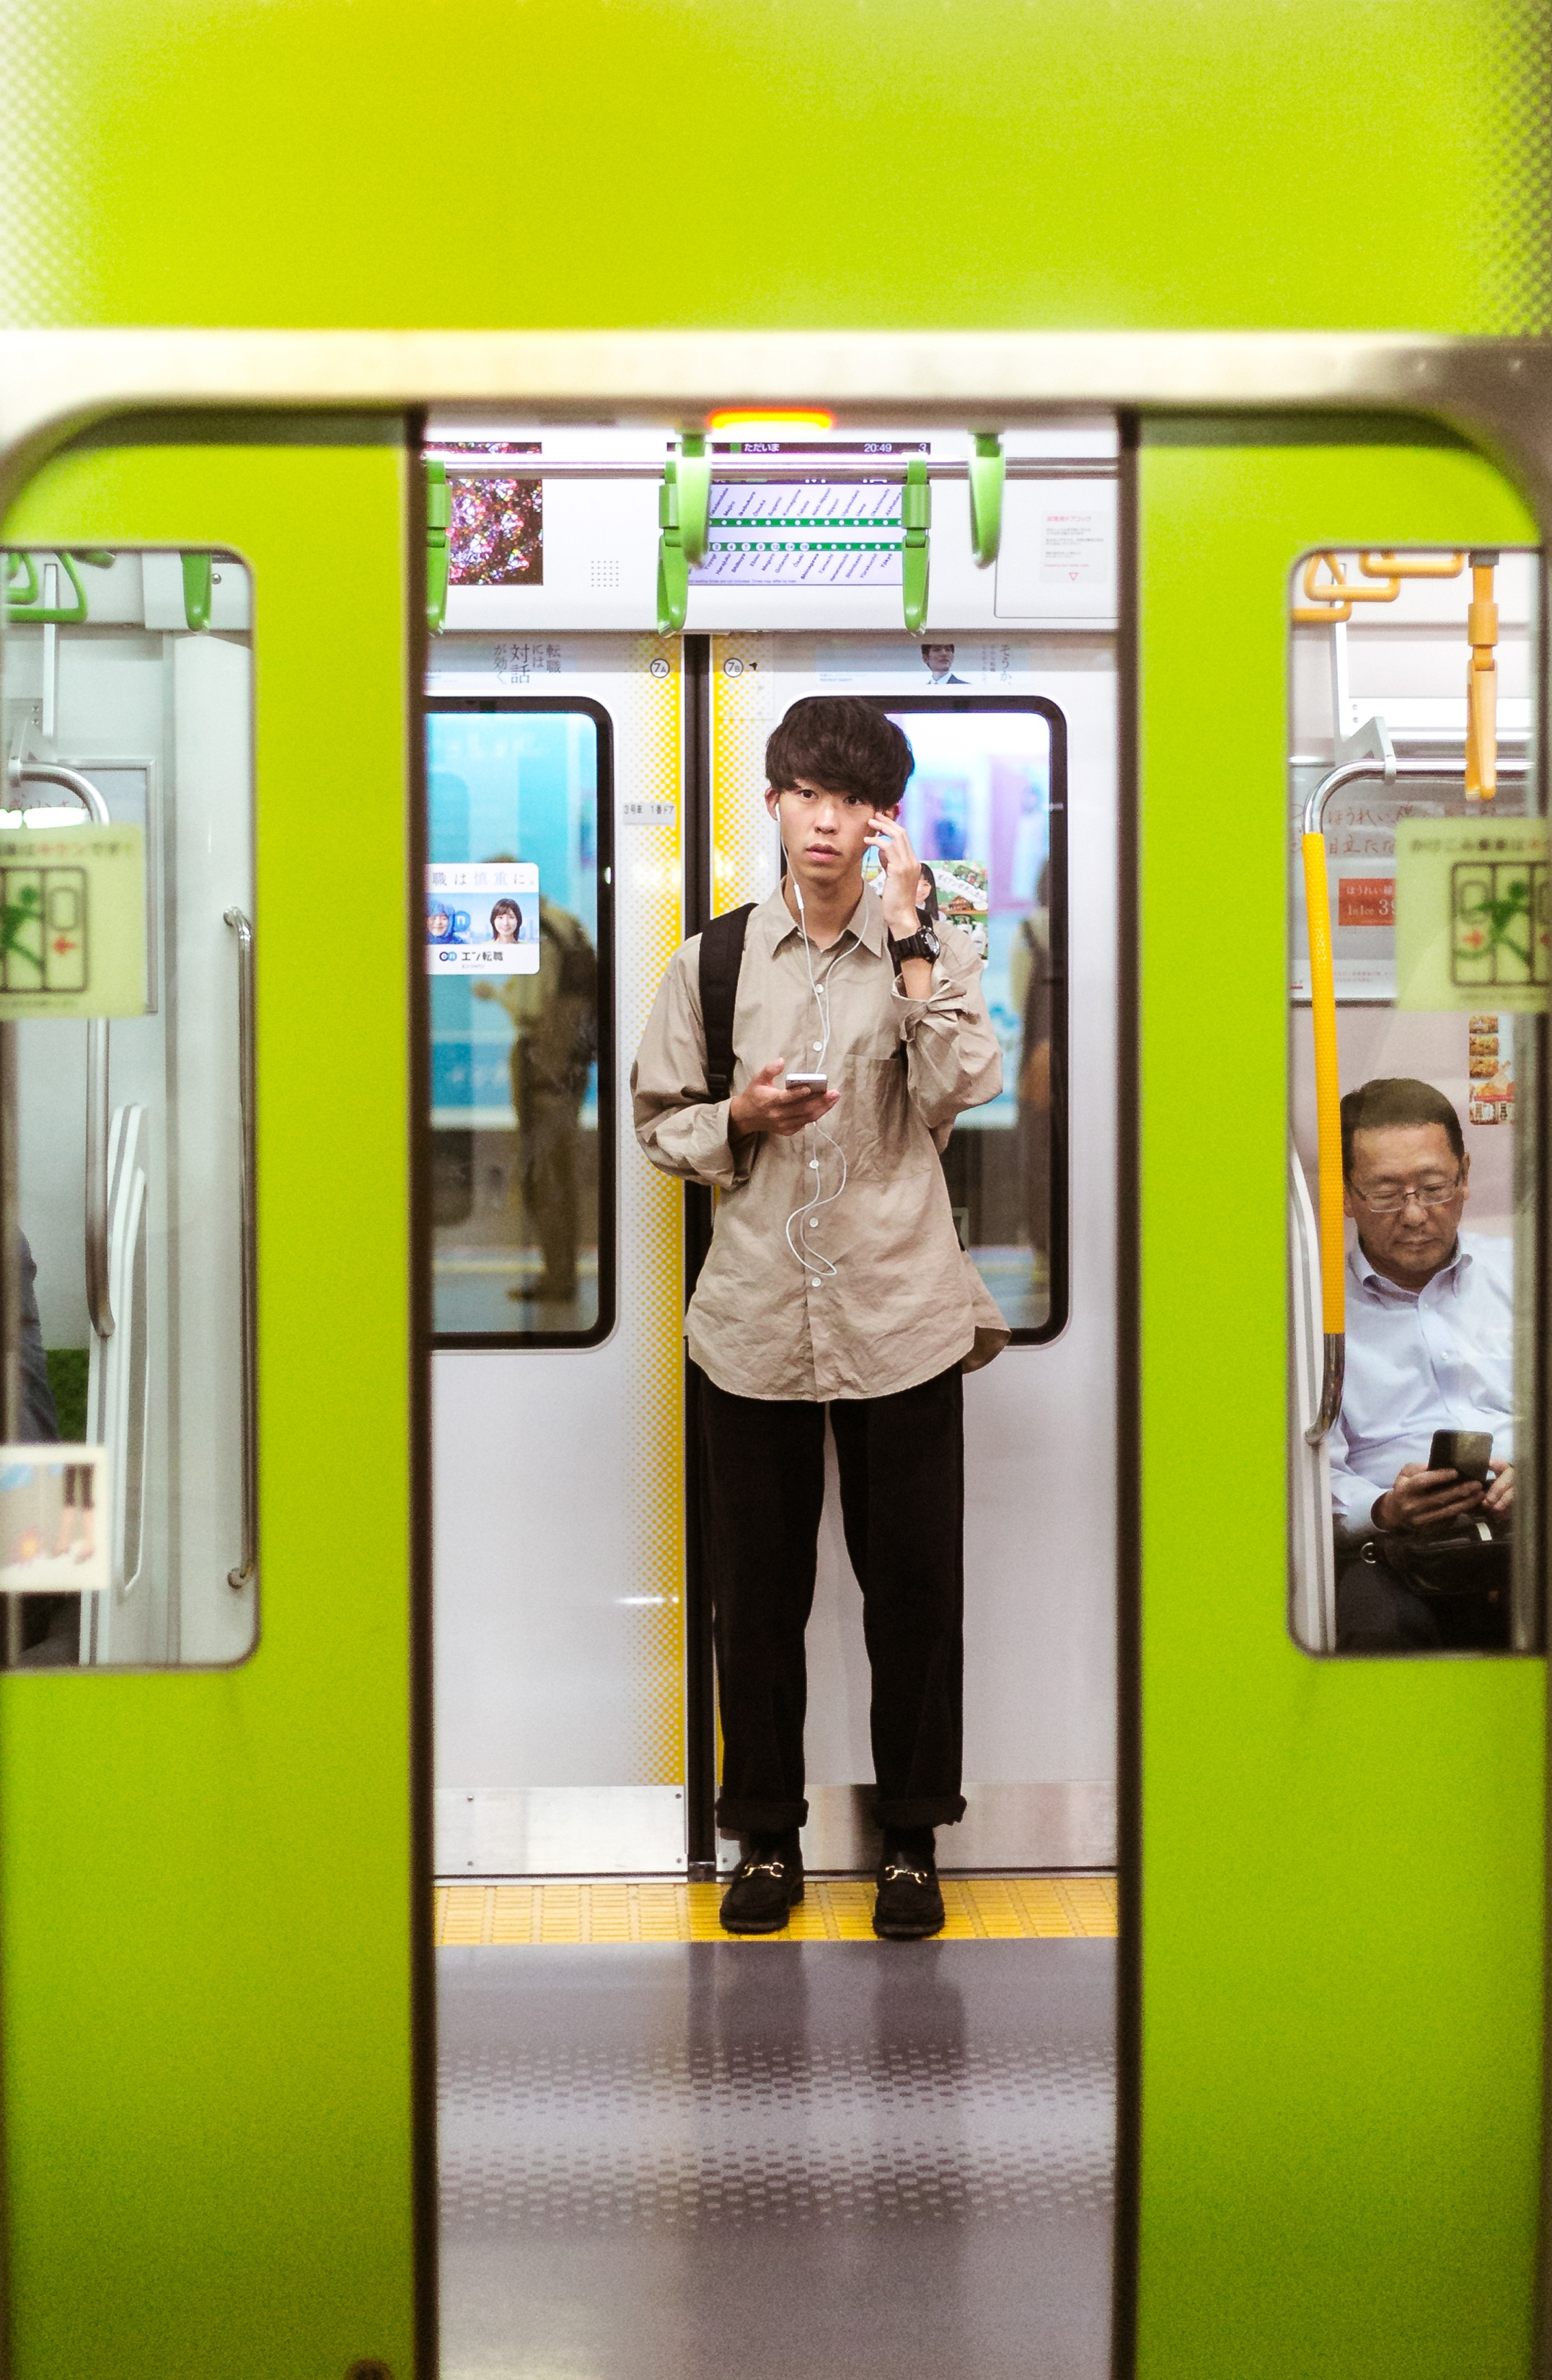 CynLagos-Japan-Teaser-Tokyo-Oct-2018+%282+of+2%29-4+Story2.jpg